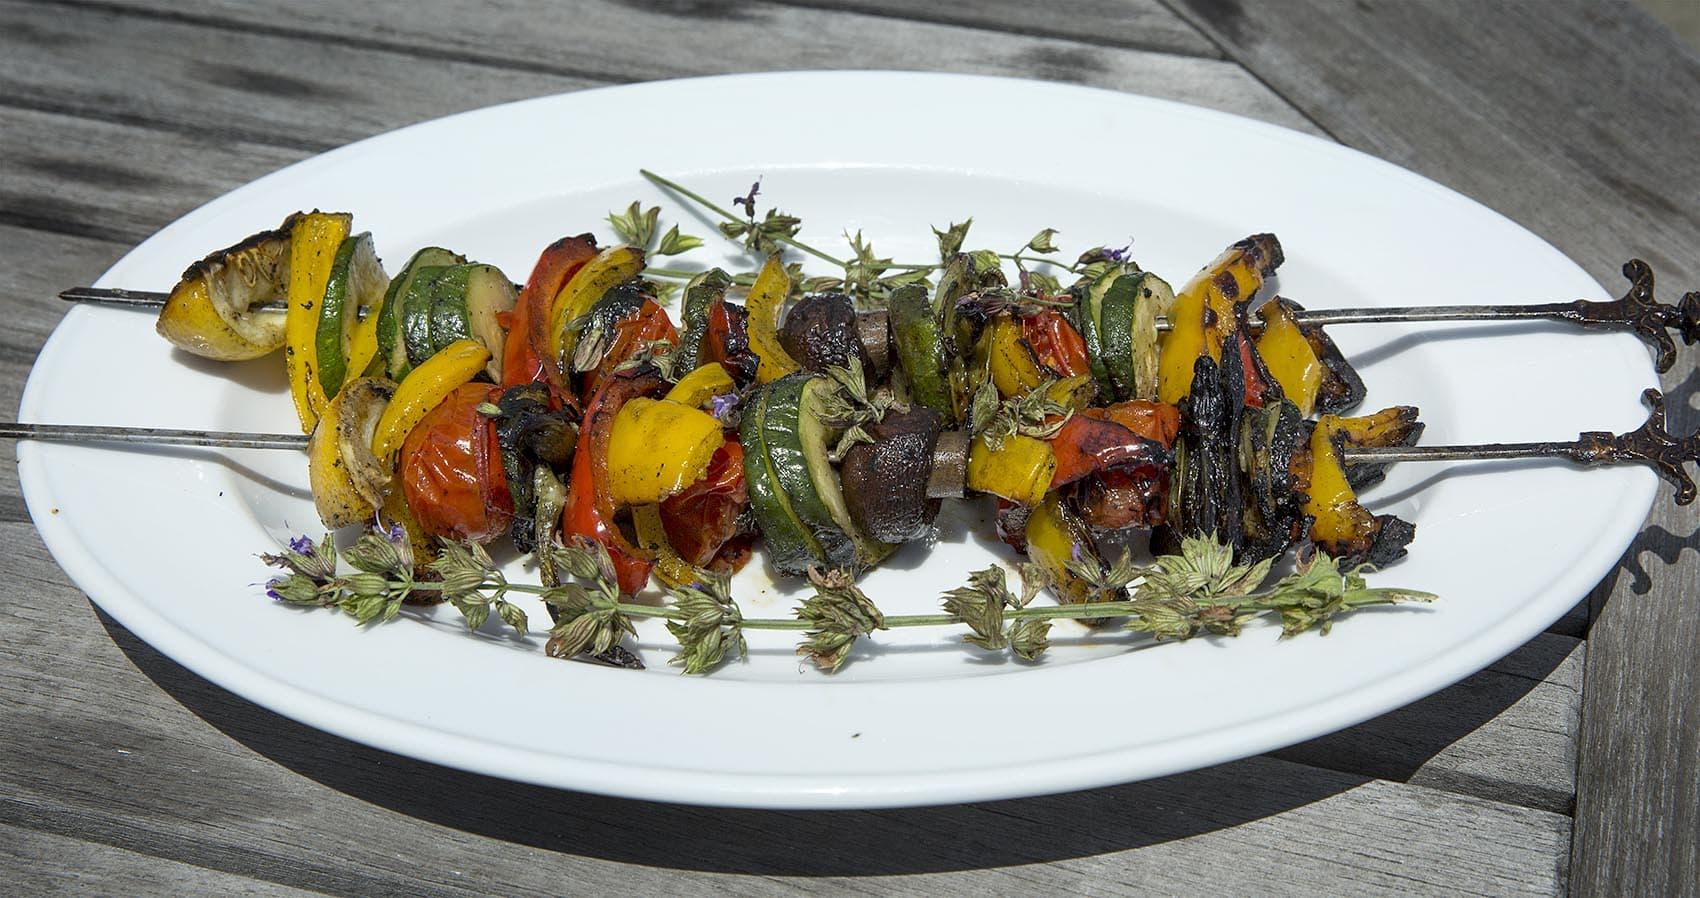 Kathy's grilled vegetable kebabs with chimichurri sauce. (Robin Lubbock/WBUR)